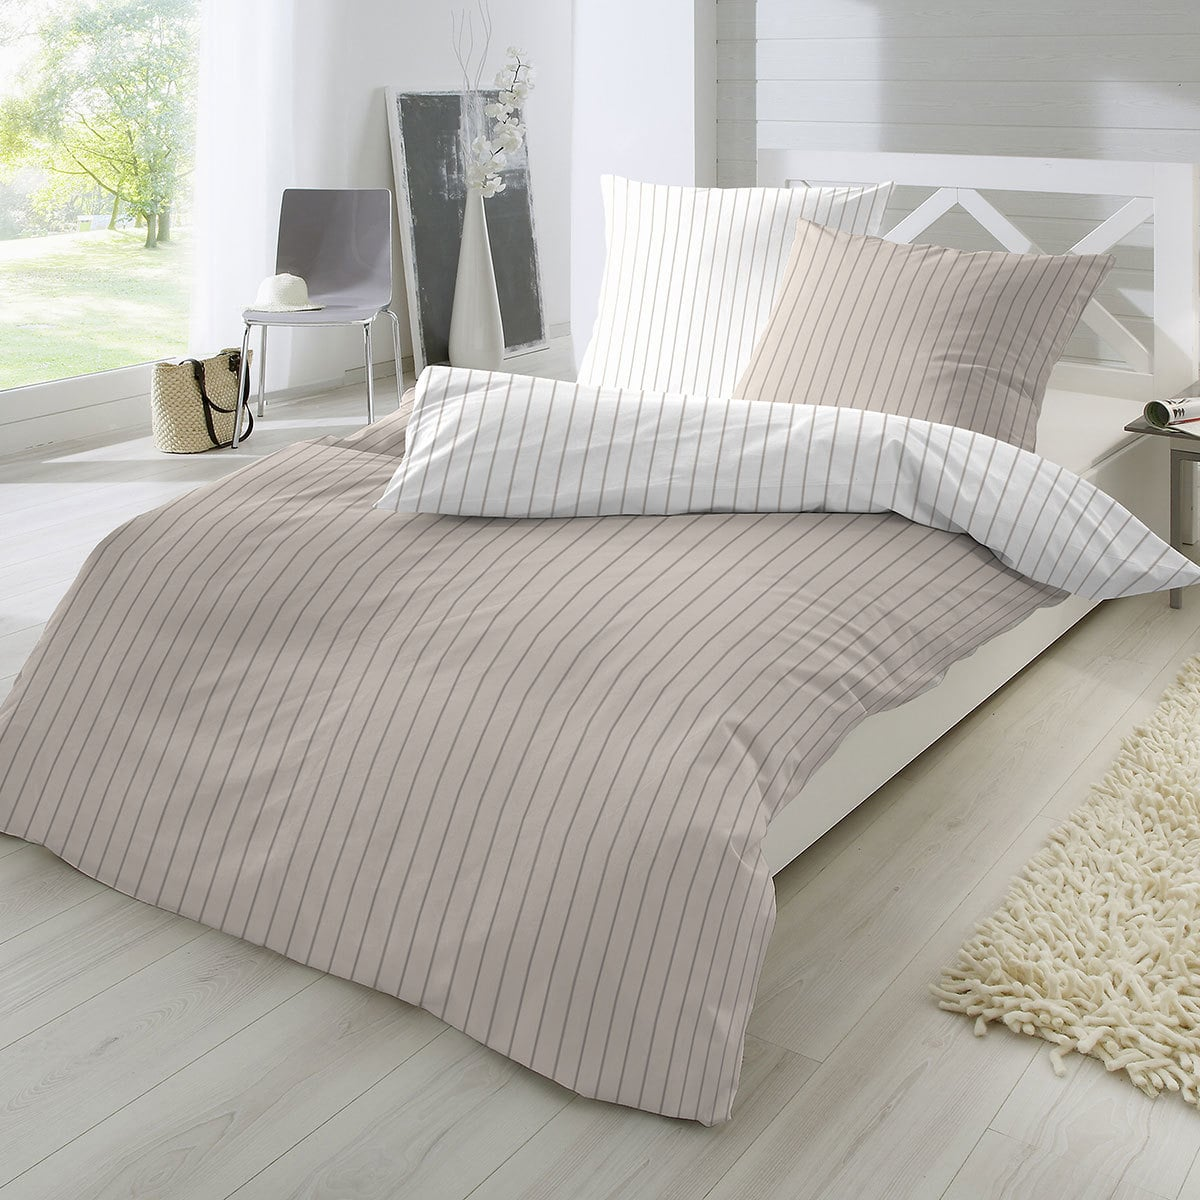 enrico coss perkal bettw sche streifen braun g nstig online kaufen bei bettwaren shop. Black Bedroom Furniture Sets. Home Design Ideas